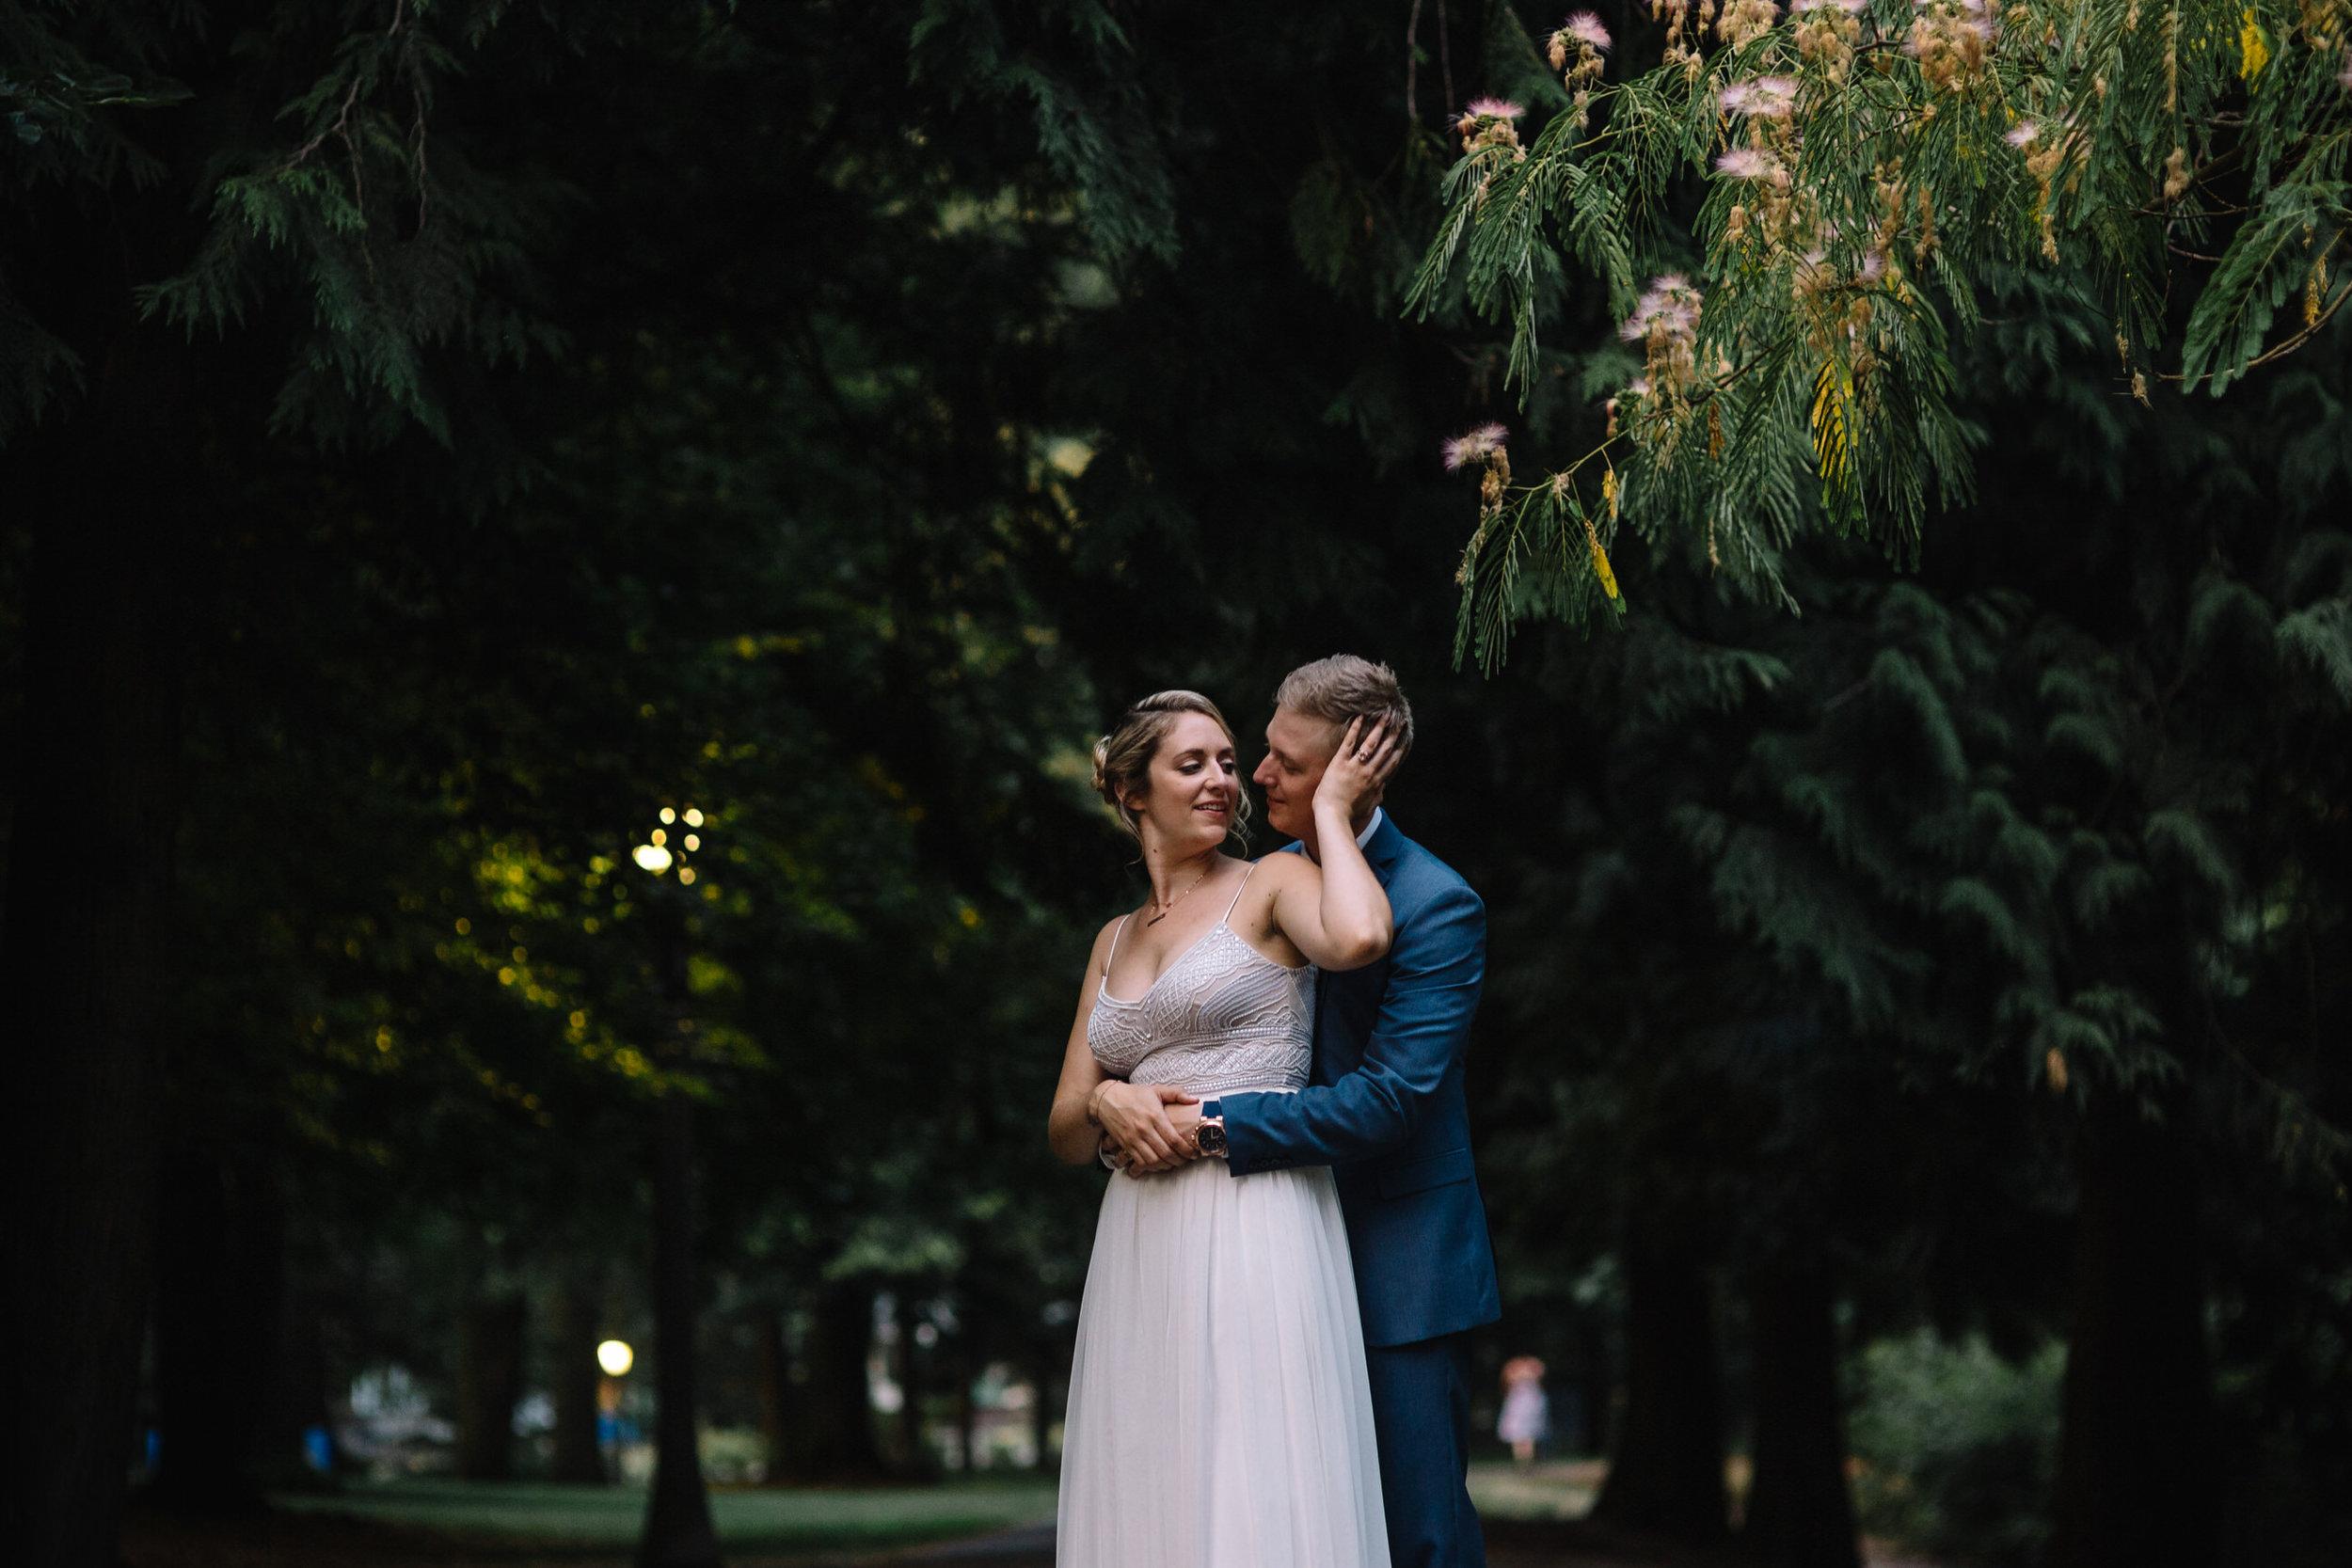 Laurelhurst Park club wedding photographer Portand pdx Oregon140.JPG